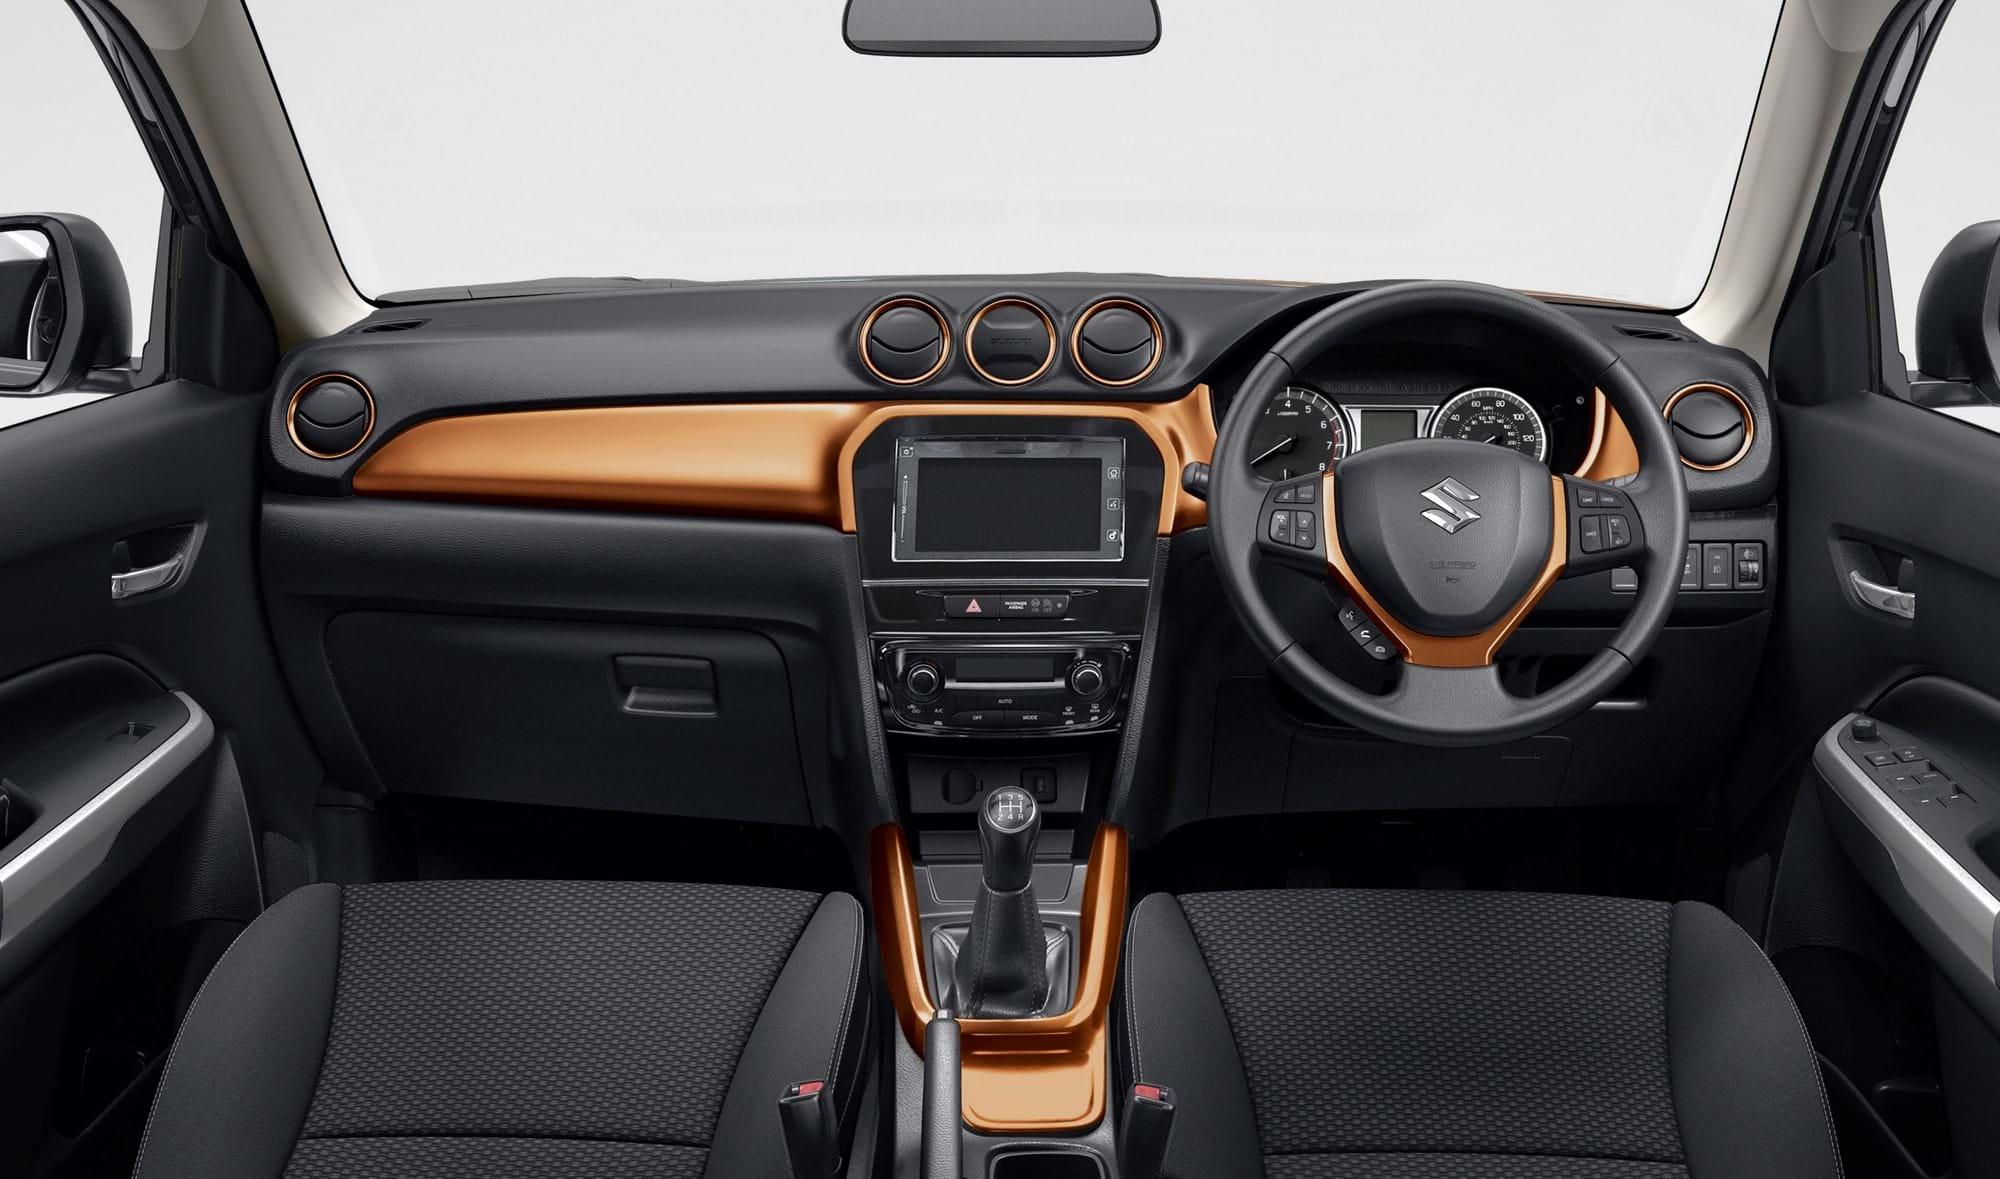 The Suzuki Vitara SZ T Specs Price